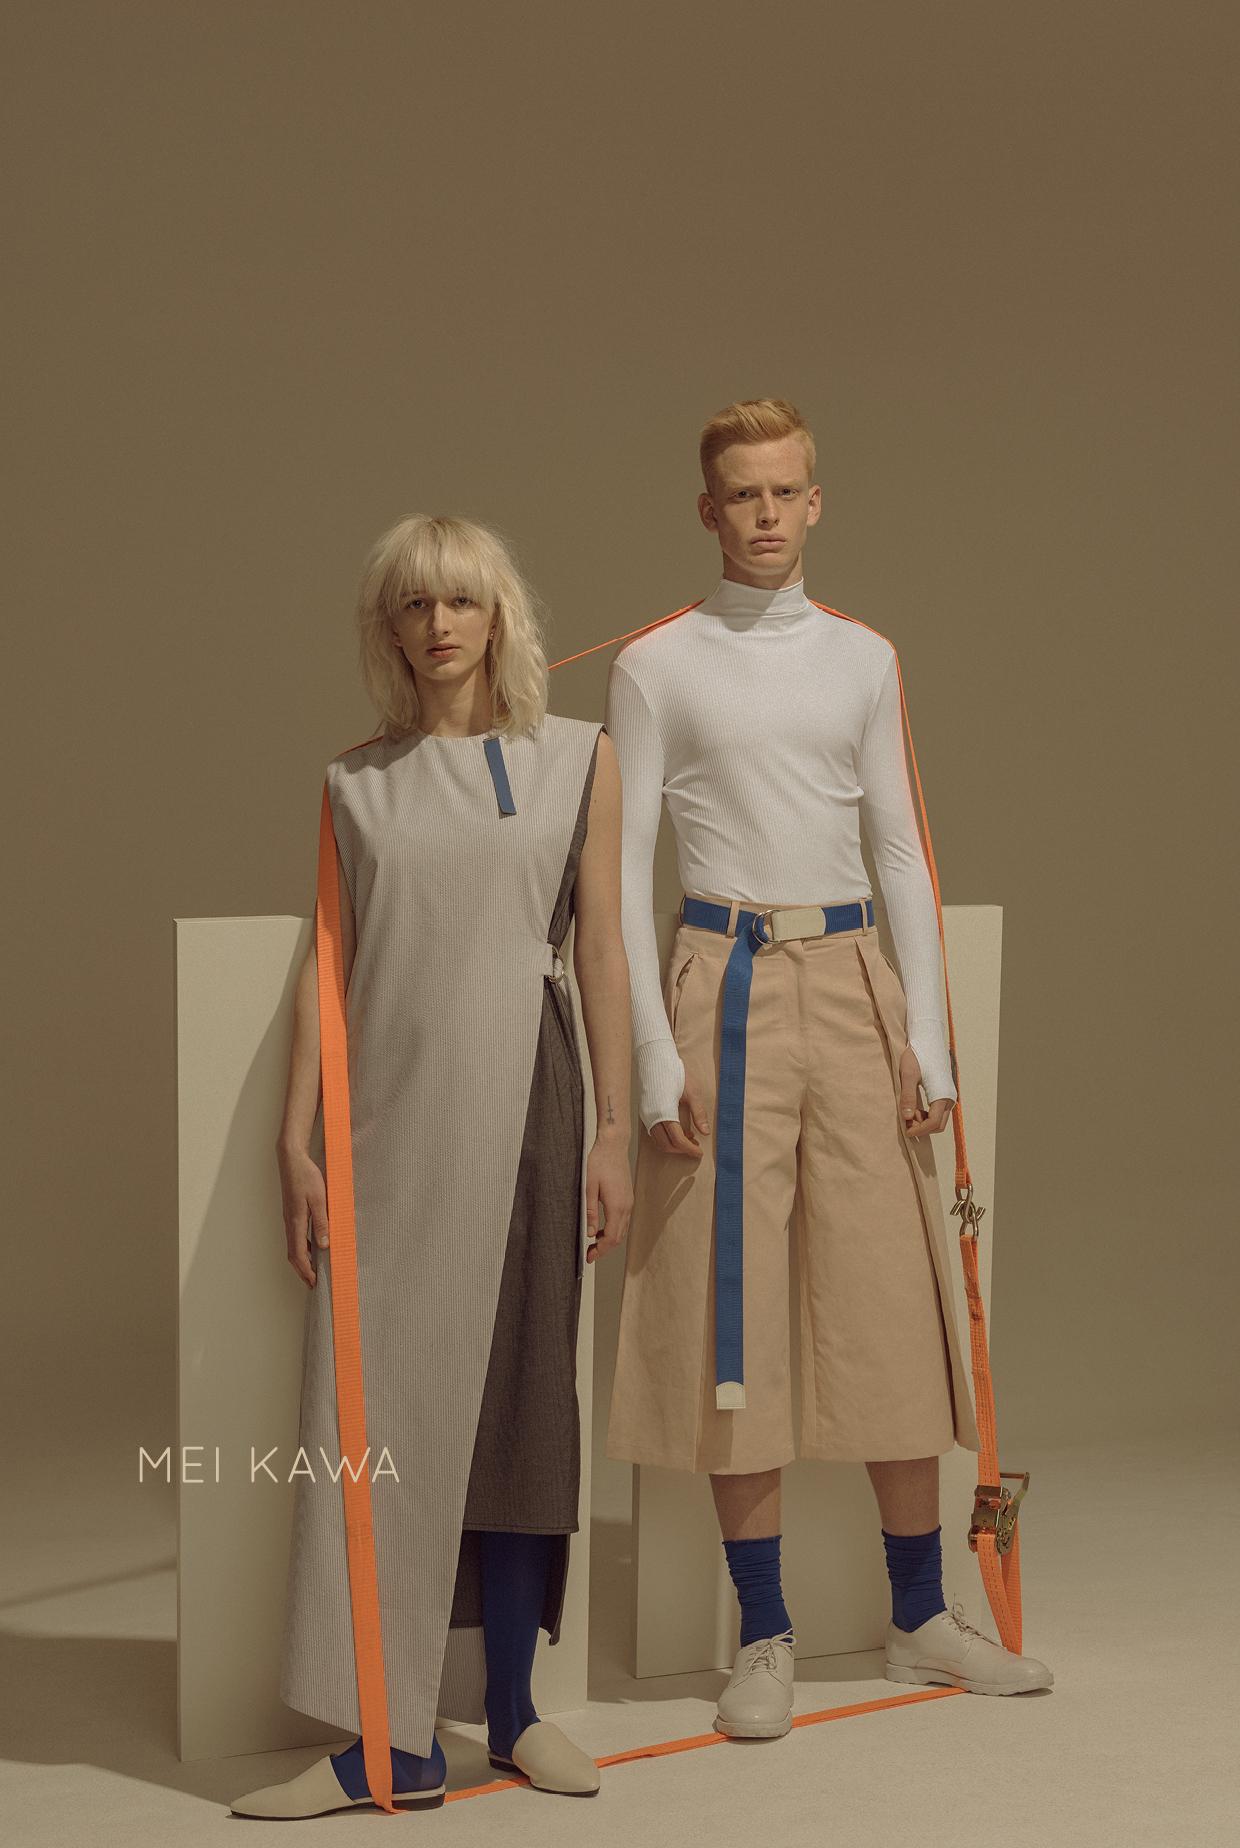 mei-kawa-ss17-campaign-1.jpg